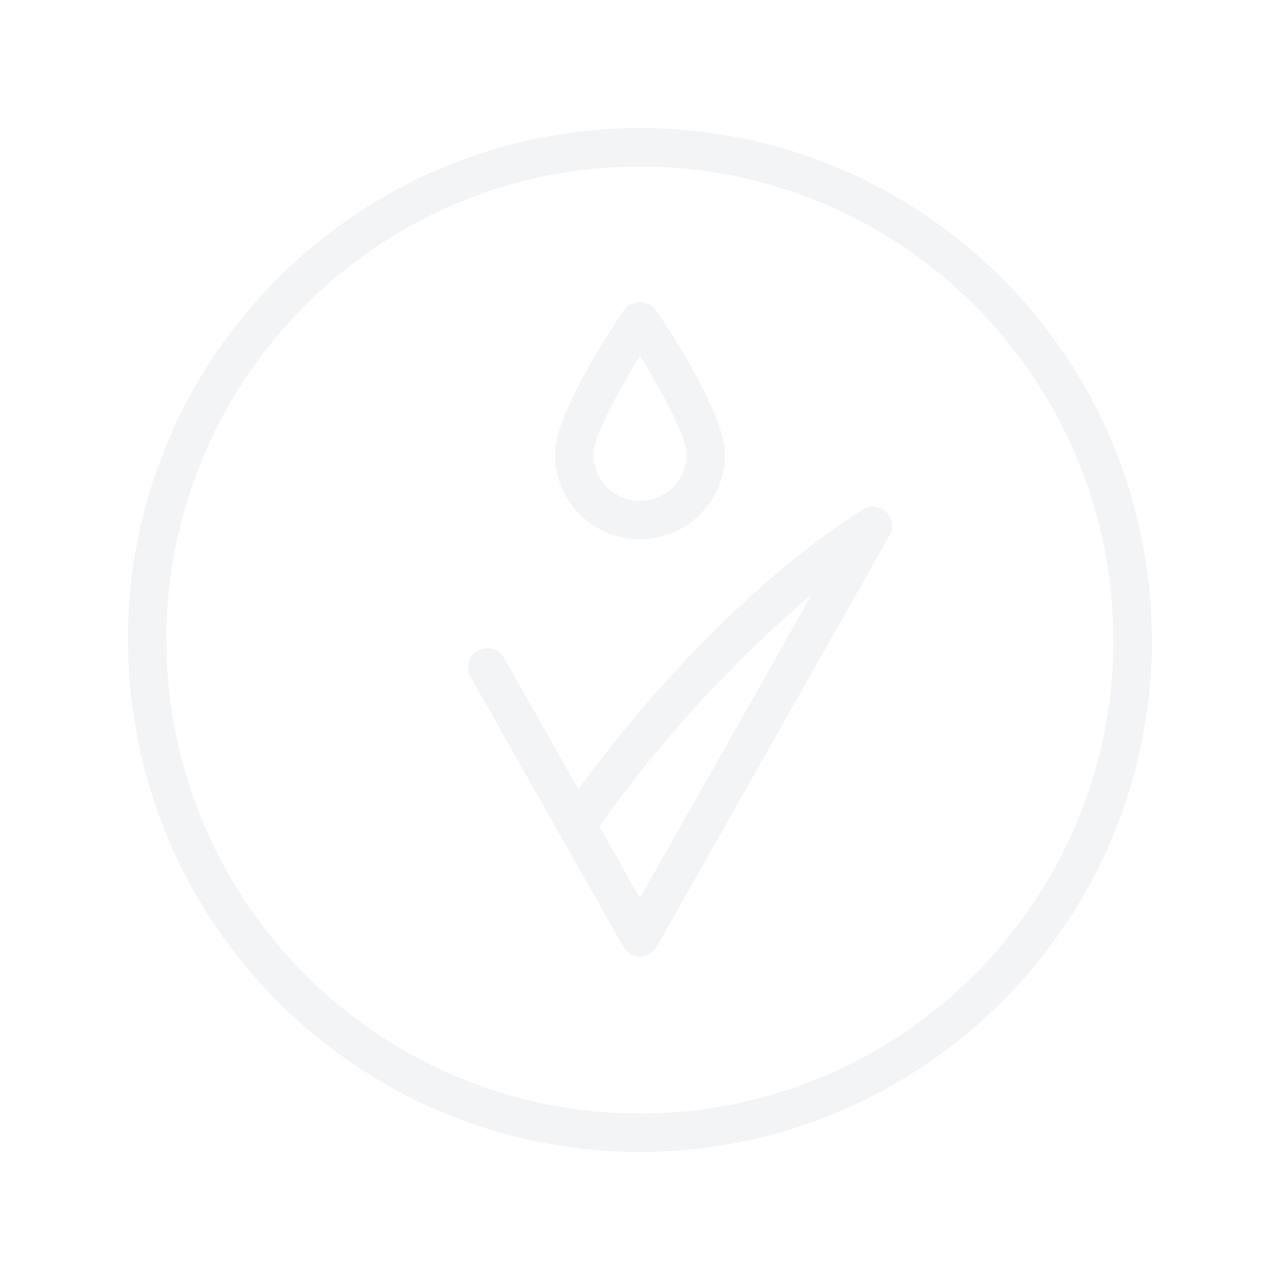 HOLIKA HOLIKA Prime Youth Gold Caviar маска для лица 25g